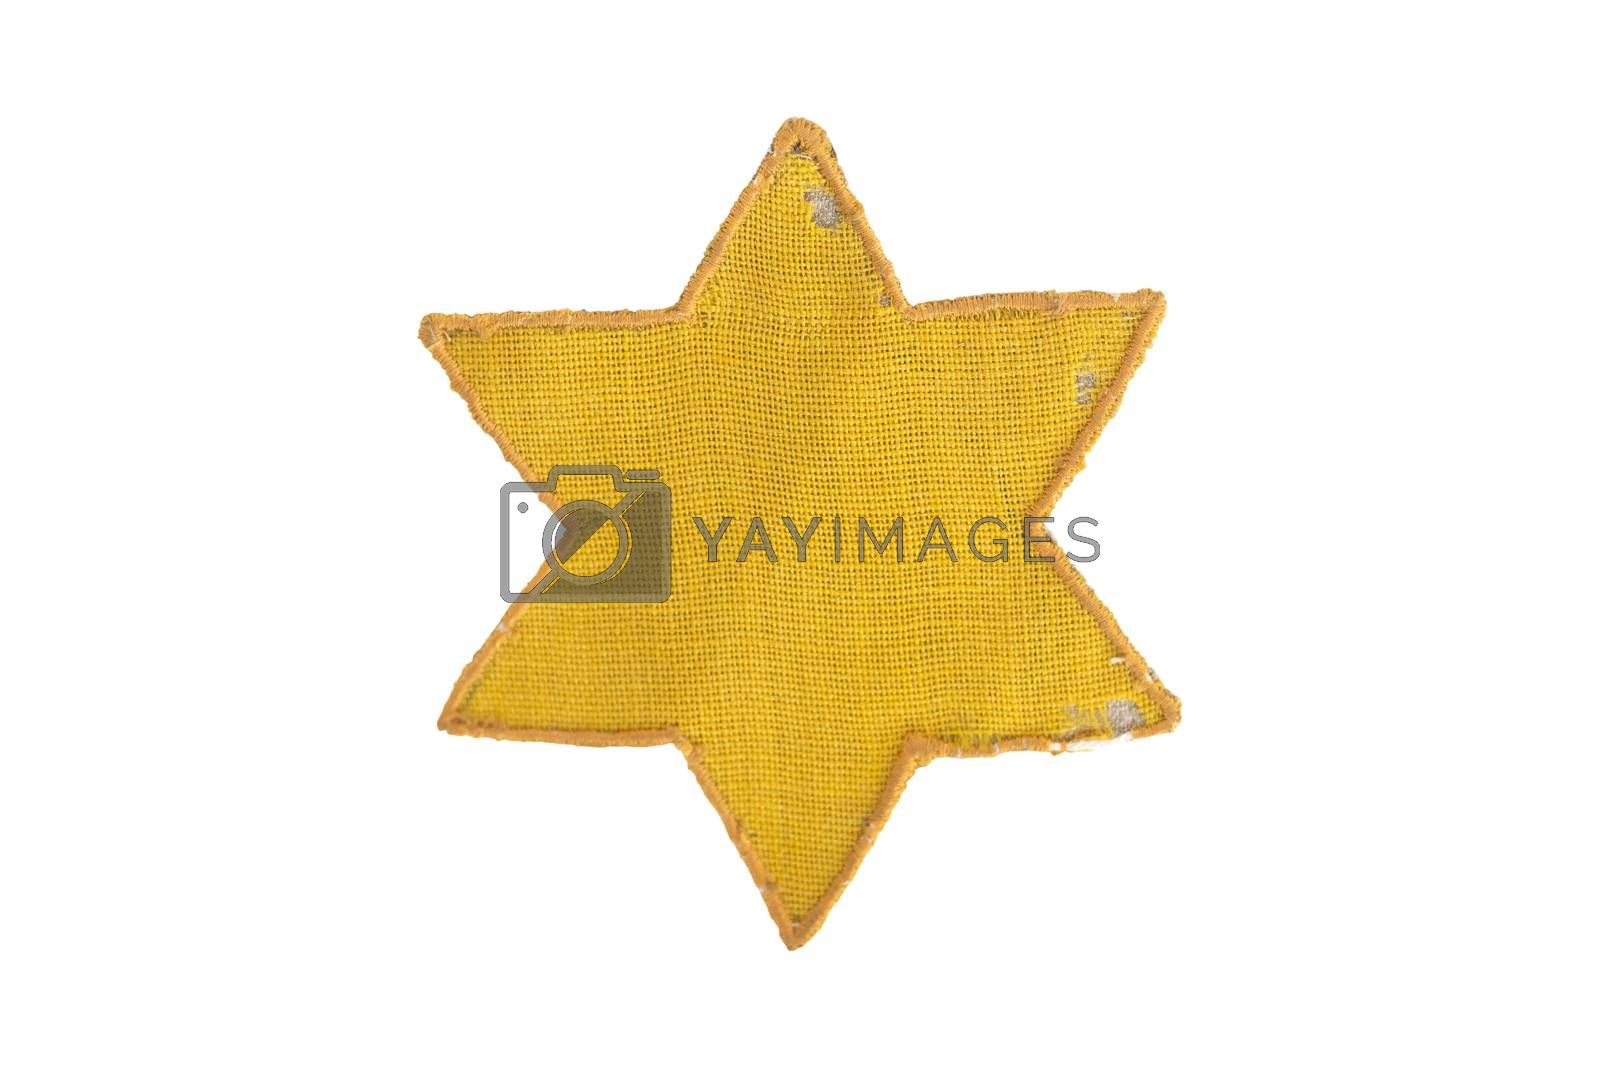 Royalty free image of Yellow Star Of David by tony4urban